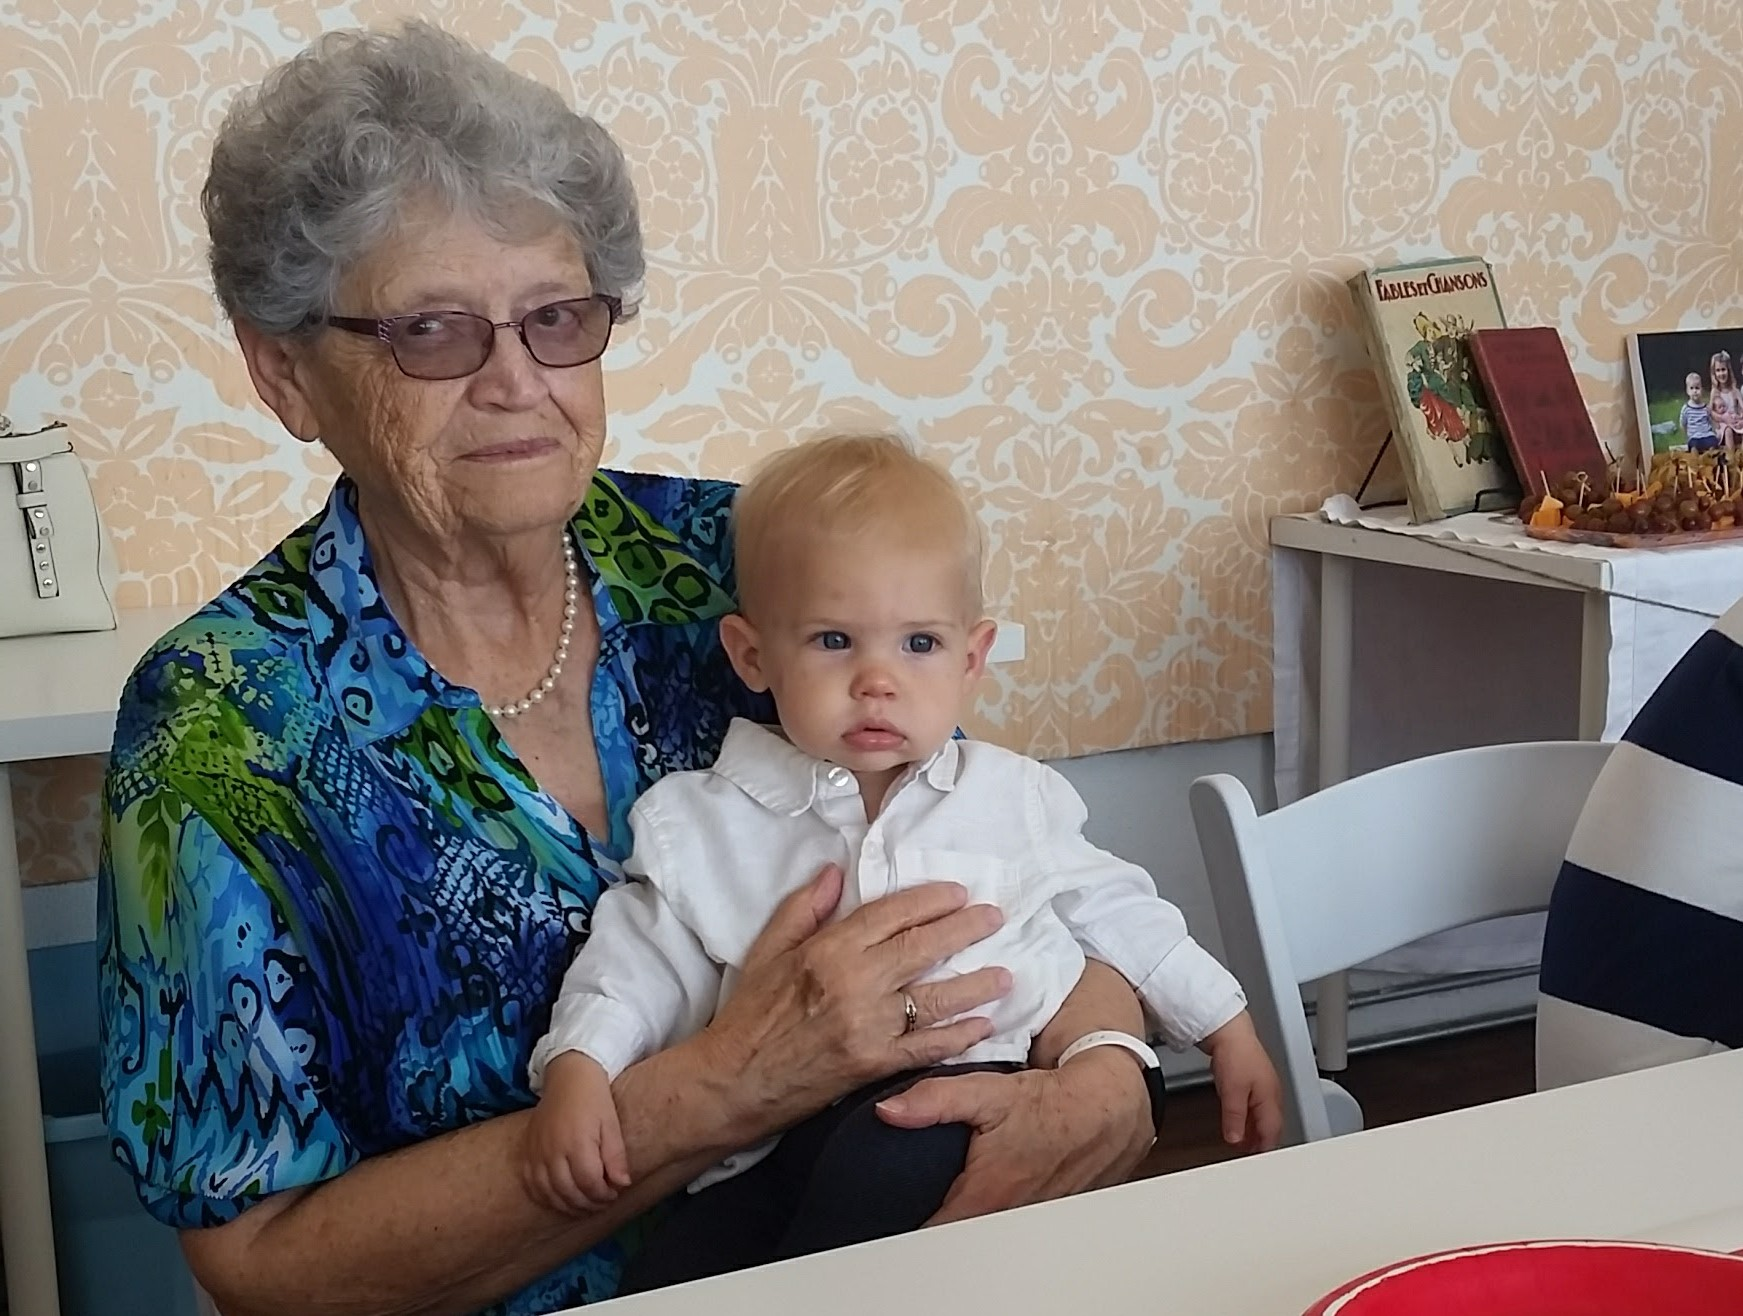 grandma and baby boy